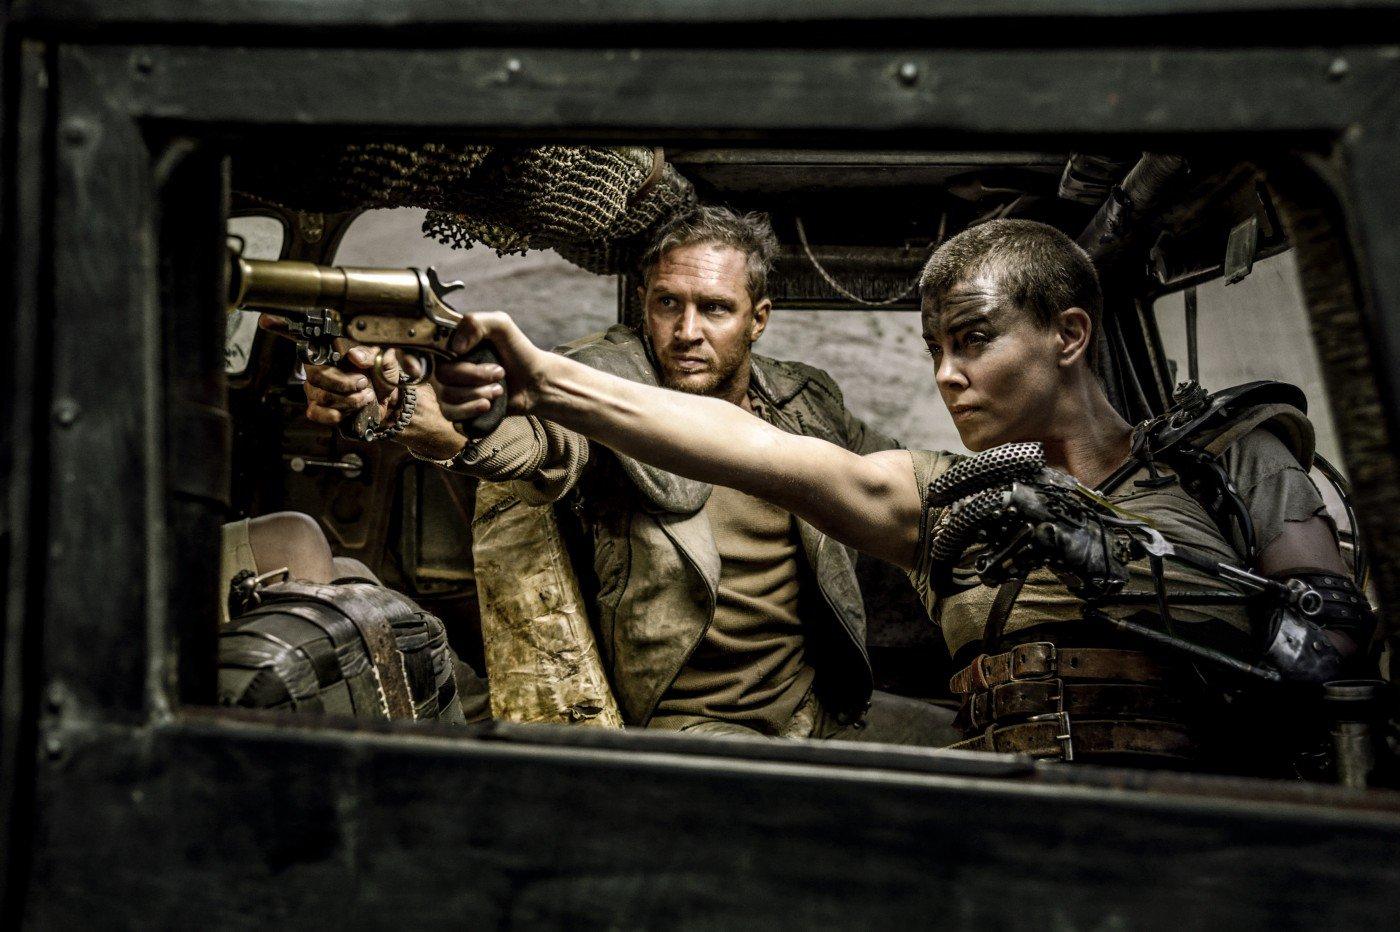 Charlize Theron in Tom Hardy v filmu Pobesneli Max: Cesta besa (Mad Max: Fury Road)